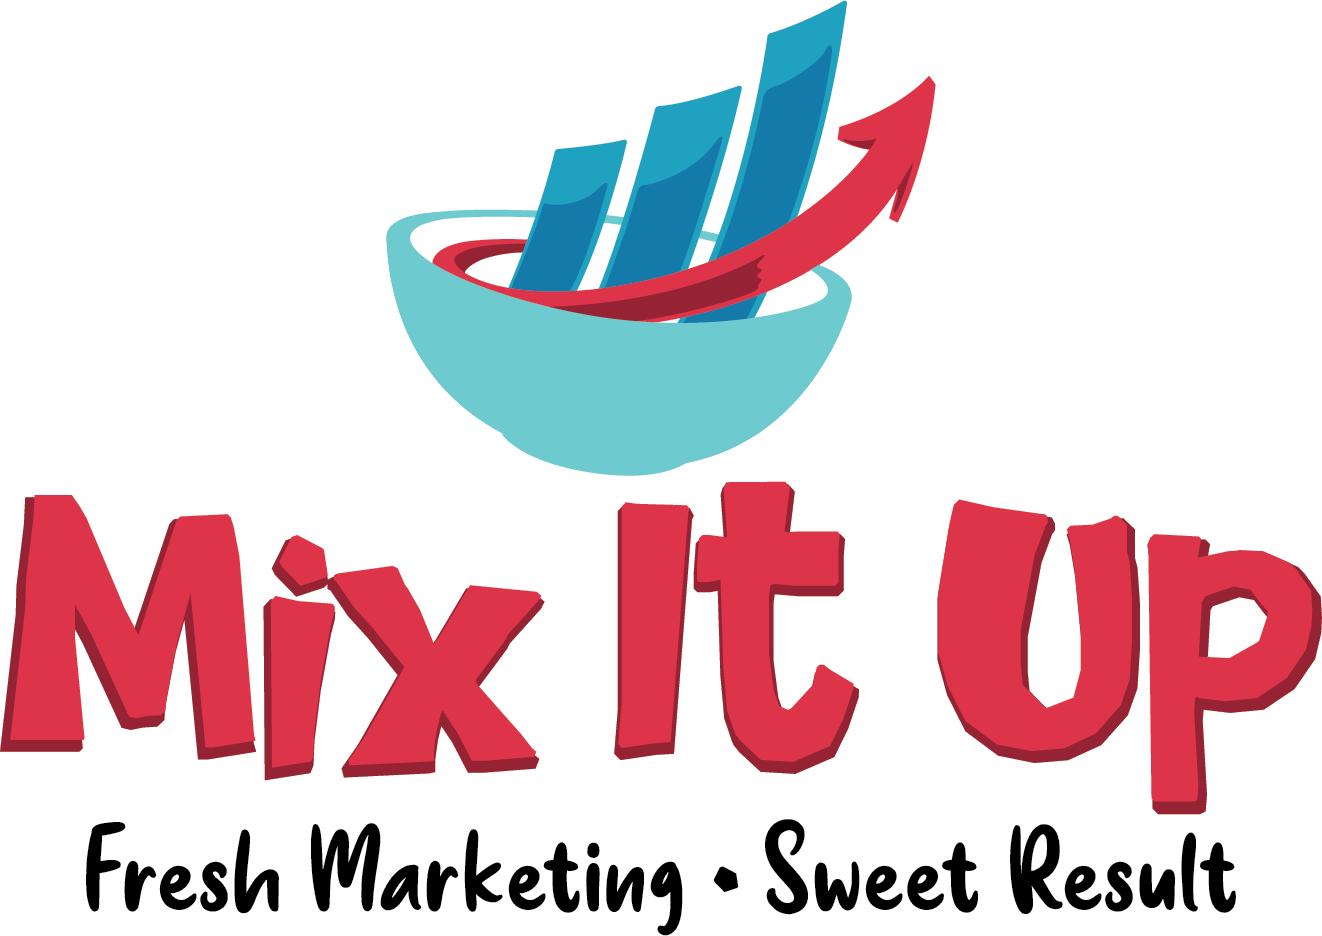 MixItUp Marketing